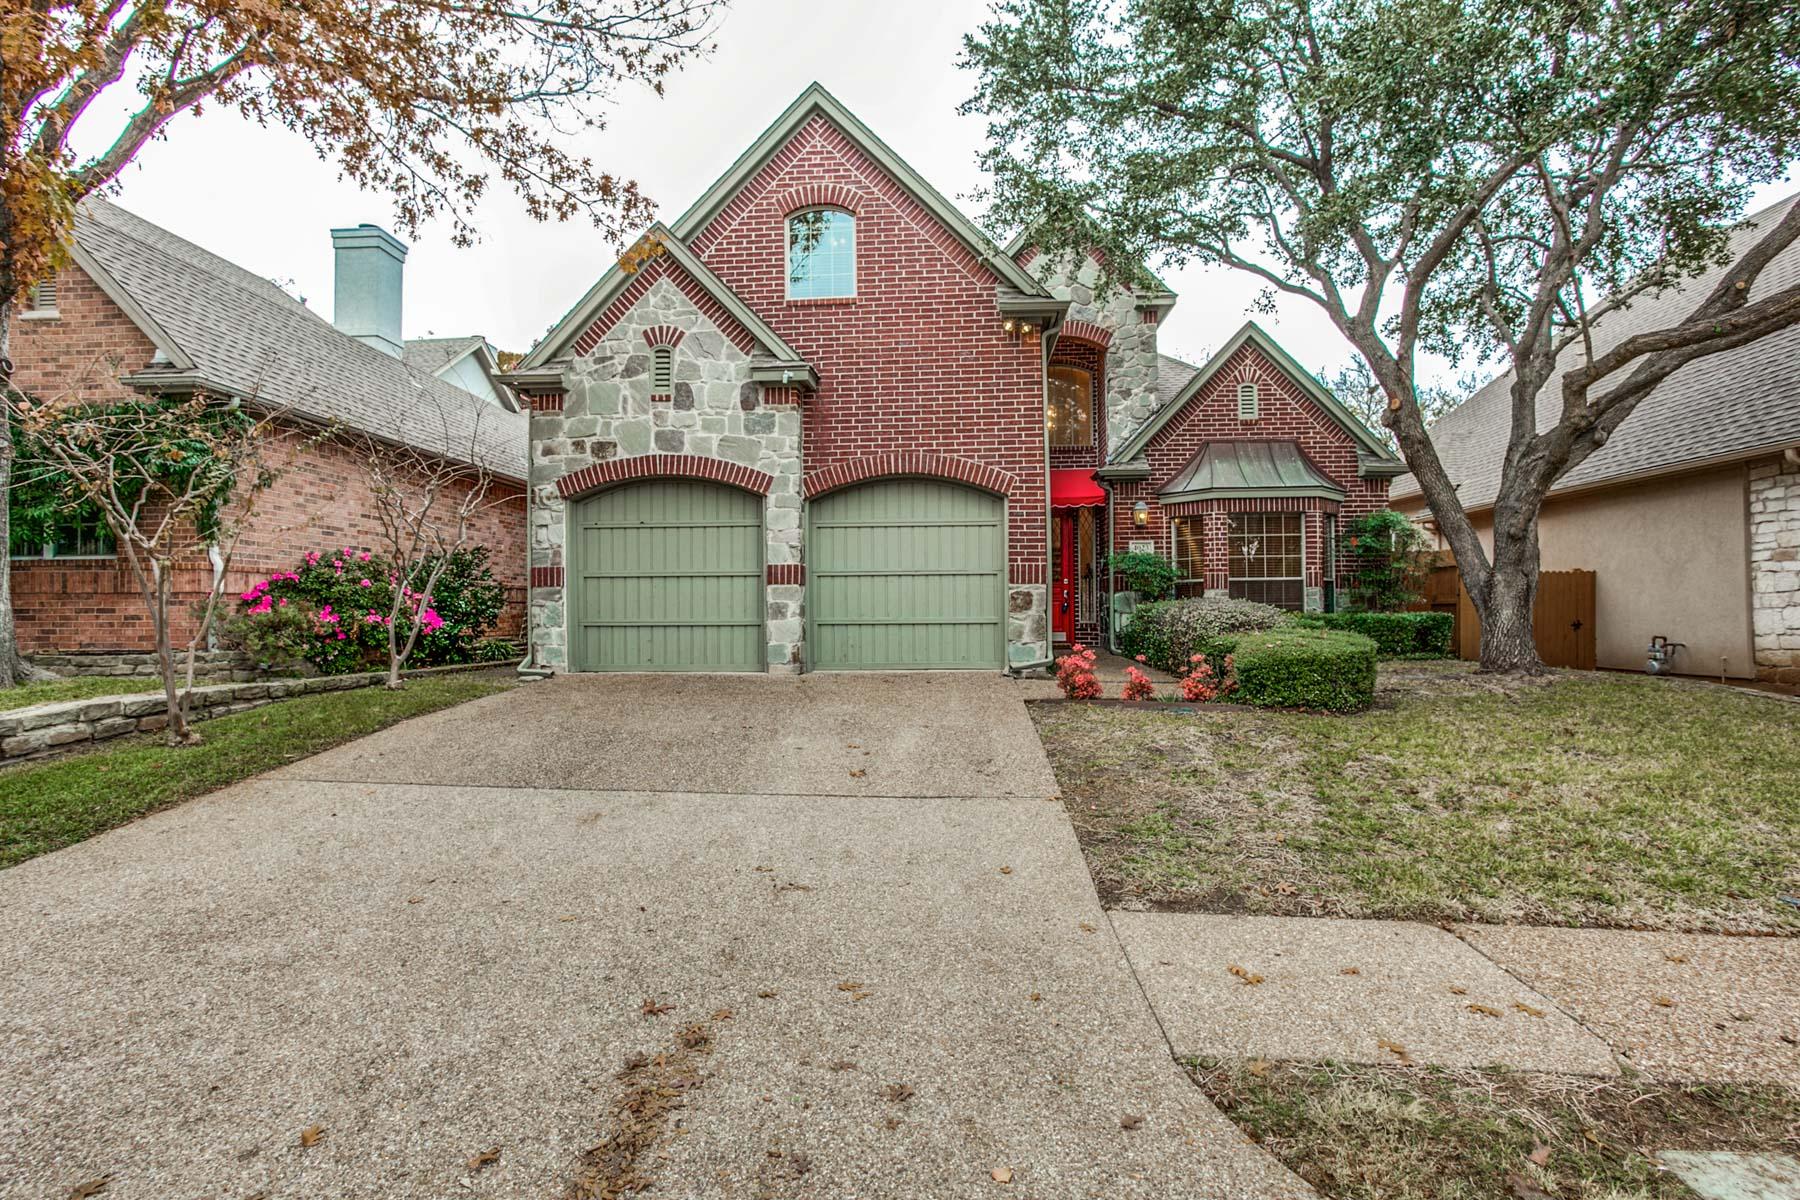 Casa para uma família para Venda às 4023 Wembley Terrace, DALLAS Dallas, Texas, 75220 Estados Unidos